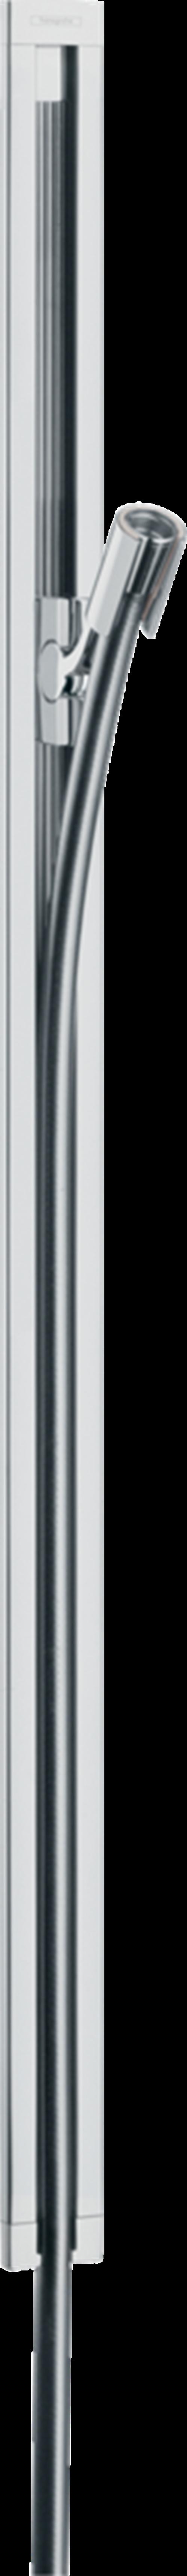 Hansgrohe Unica 27636000